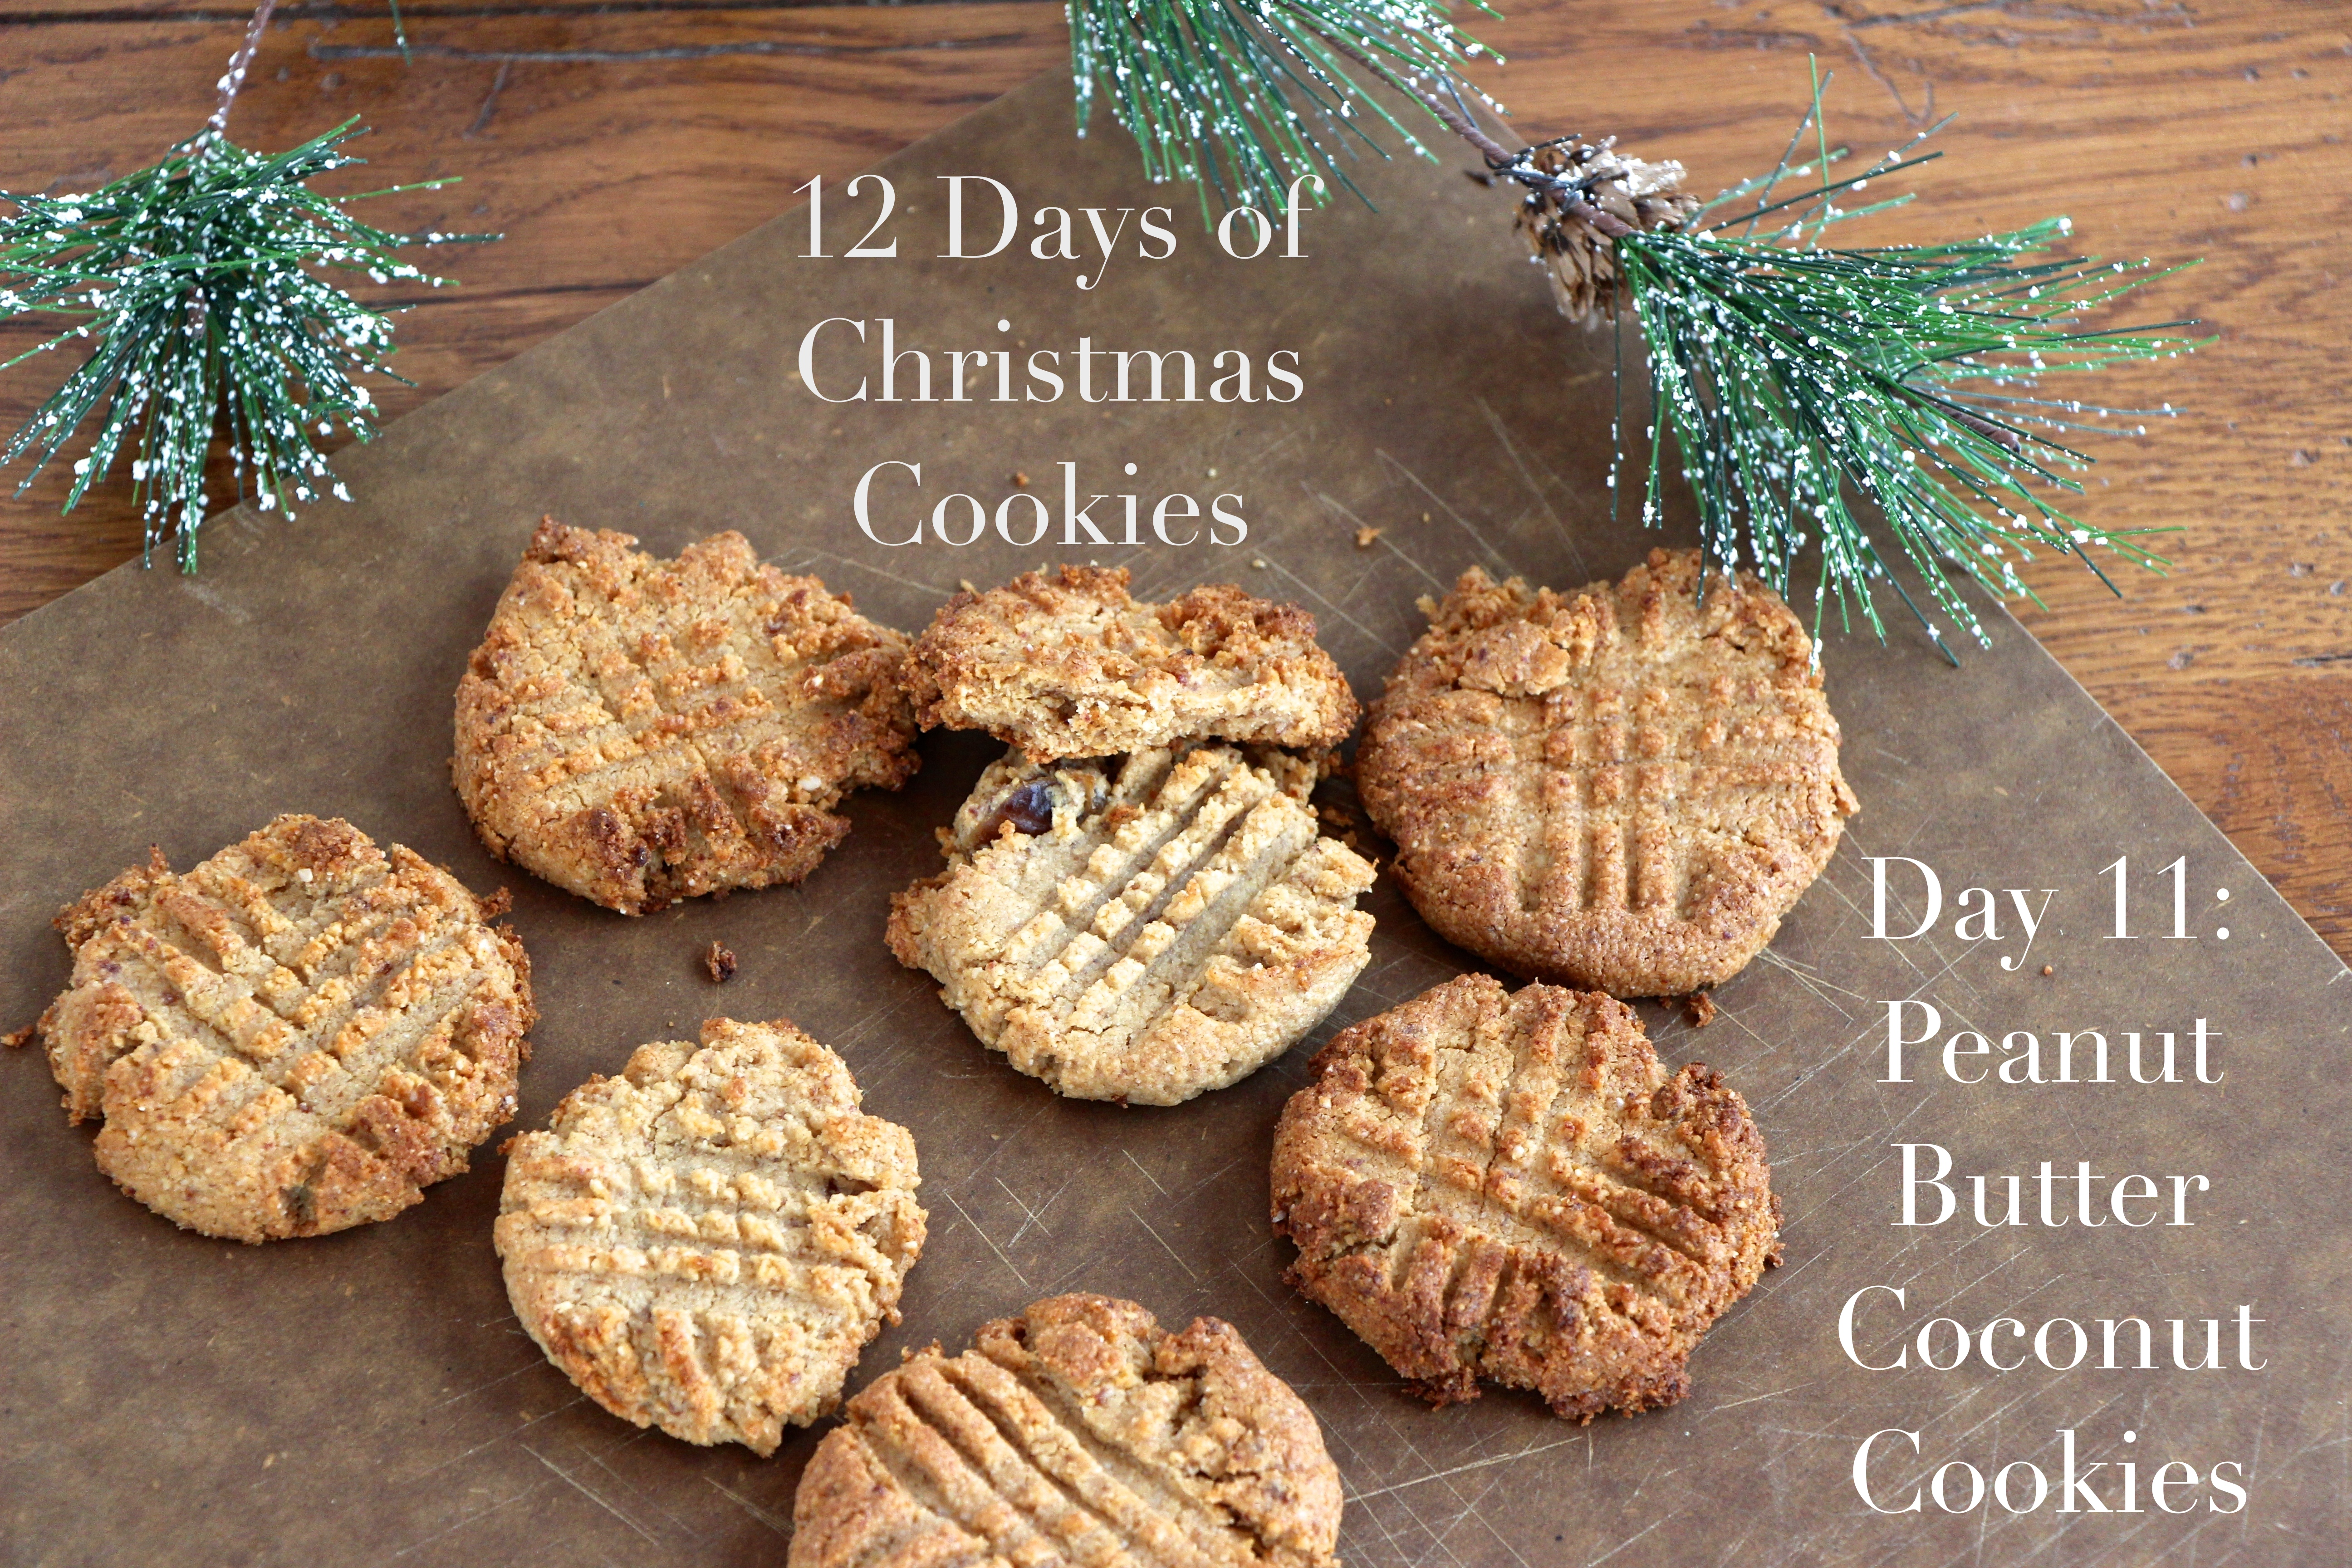 Day 11: Peanut Butter Coconut Cookies | Meghan Birt